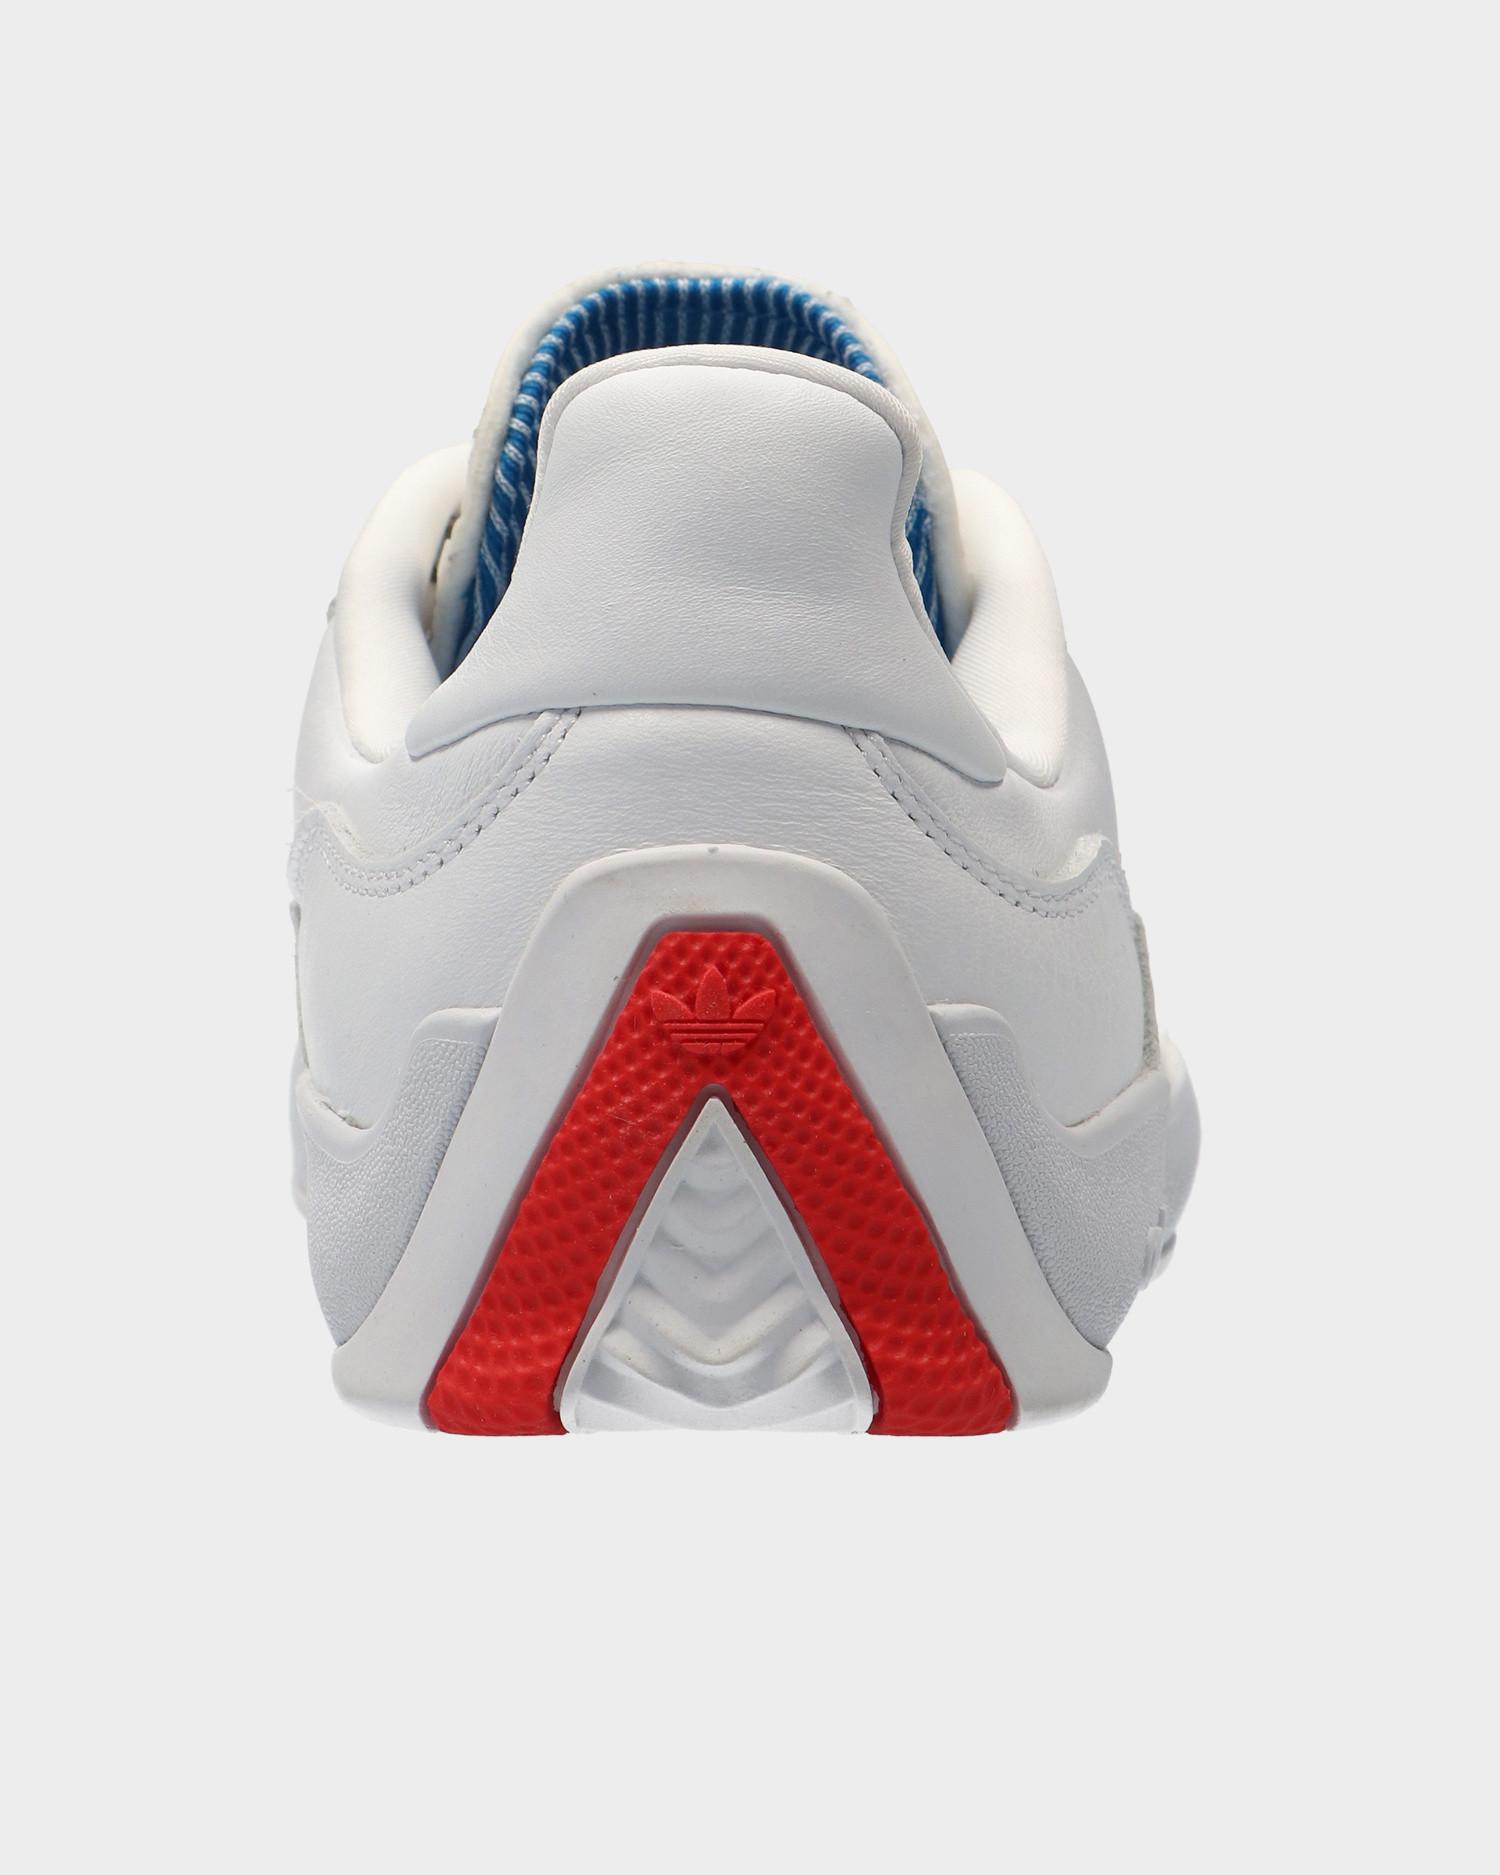 adidas Skateboarding Puig Cloud White/Blue Bird/Vivid Red